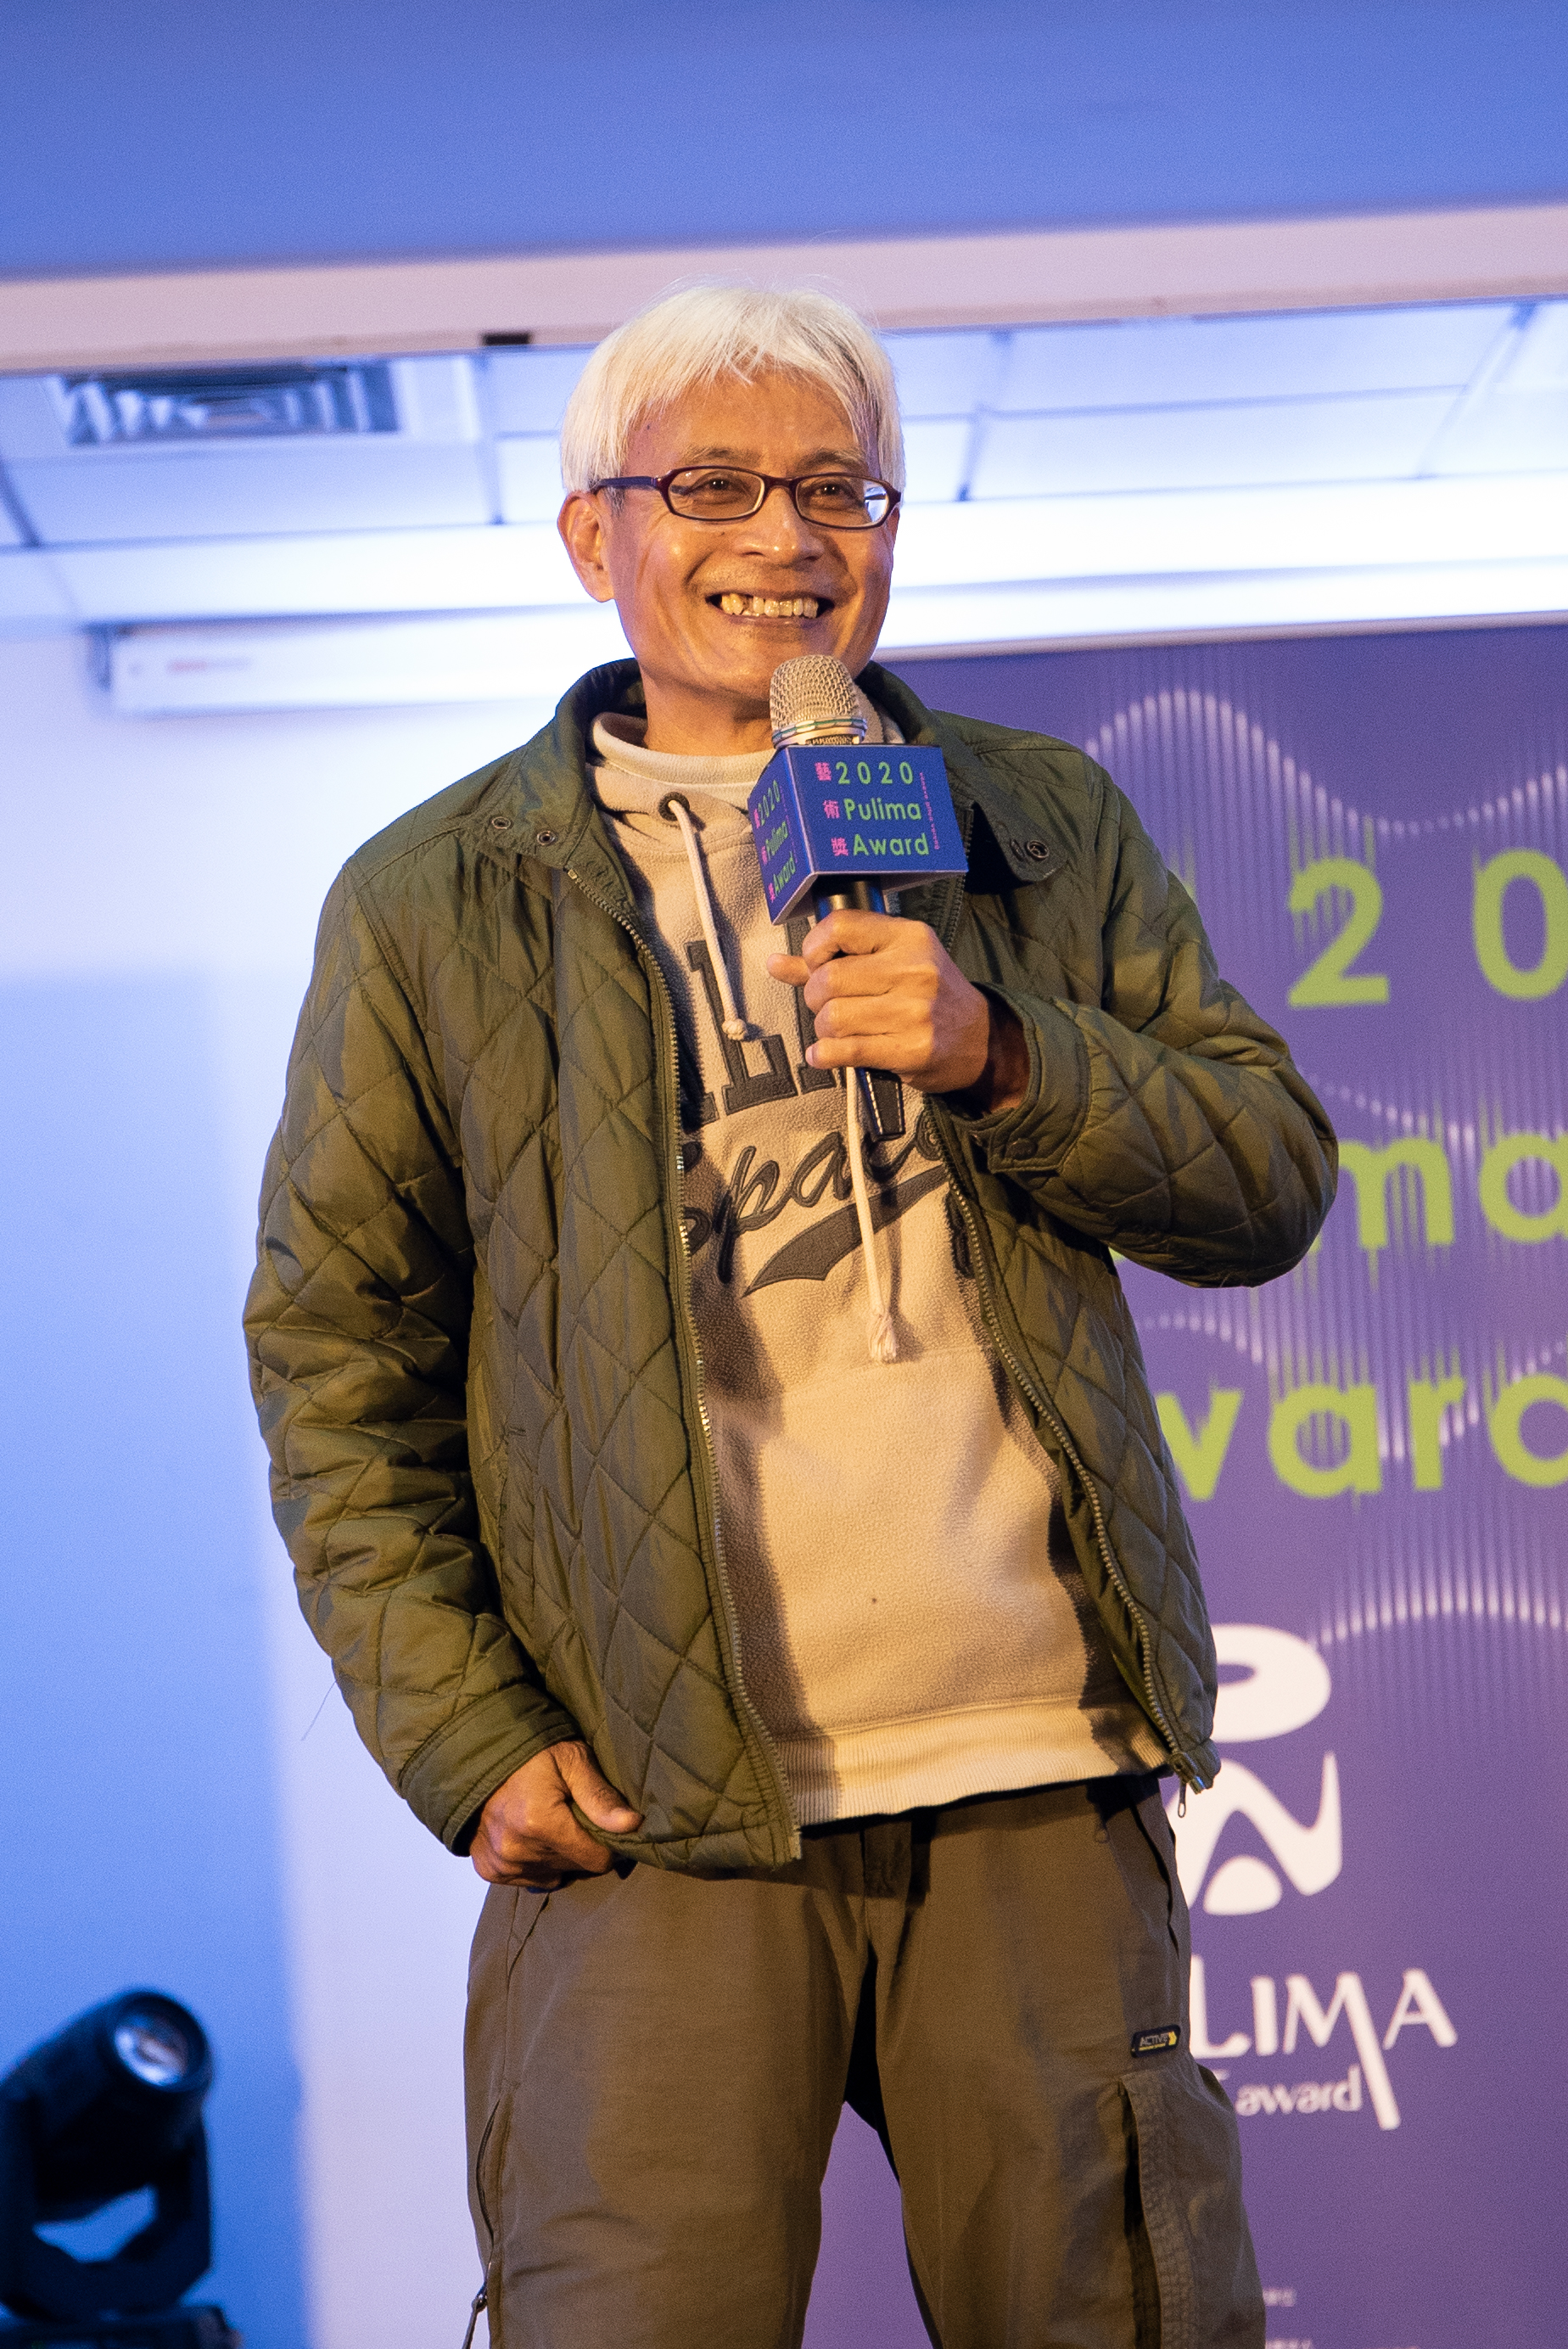 Pulima藝術獎表演創作徵件競賽評審團主席達卡鬧。(圖/財團法人原住民族文化事業基金會提供)